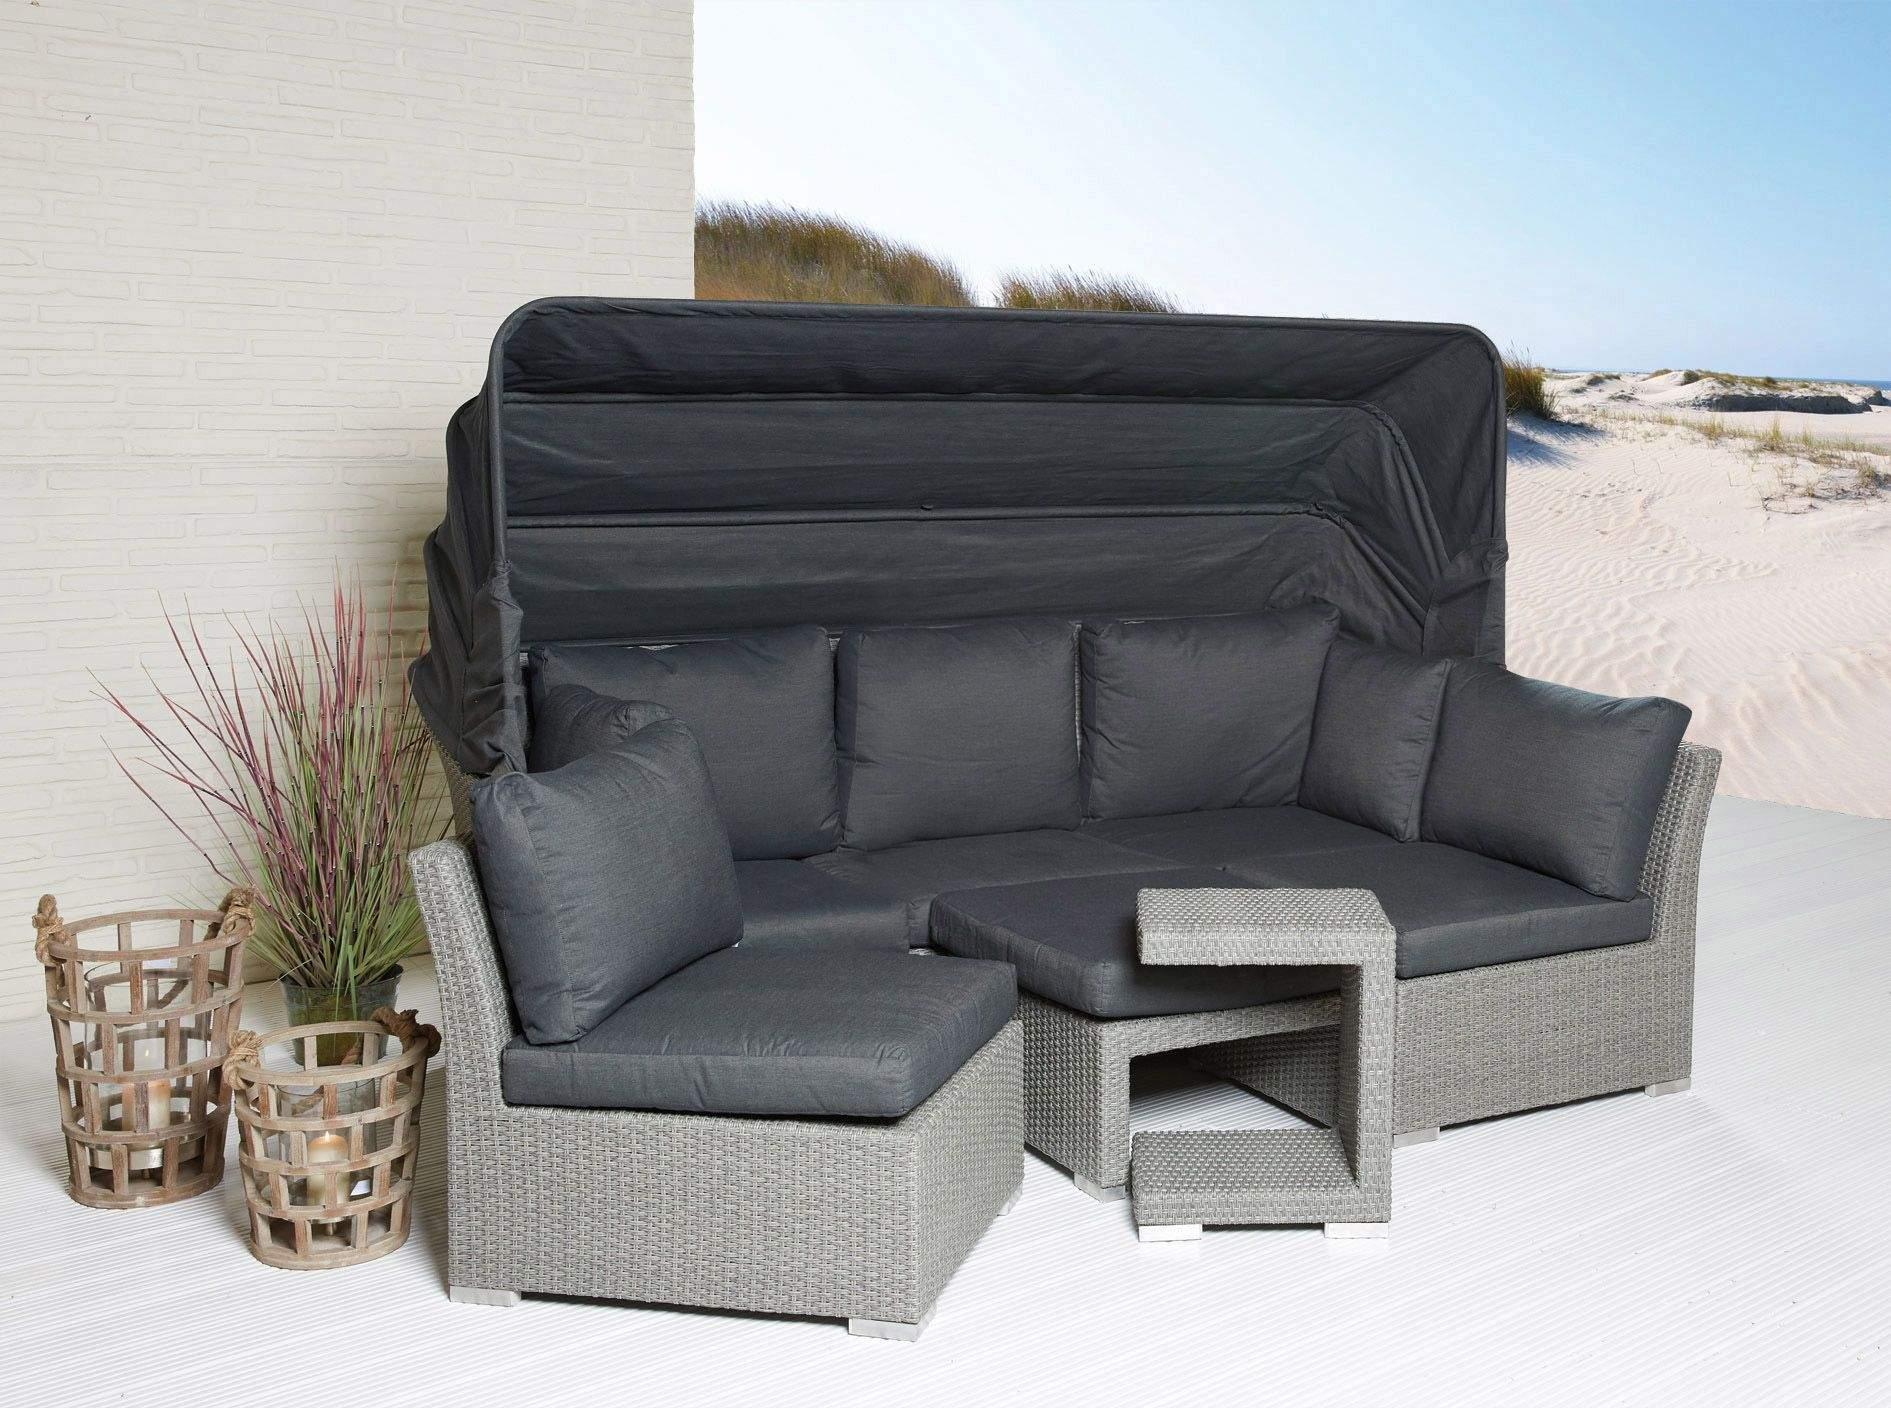 Garten Lounge Grau Luxus sonneninsel Set 5 Teilig Modesto sonneninsel Strandkorb